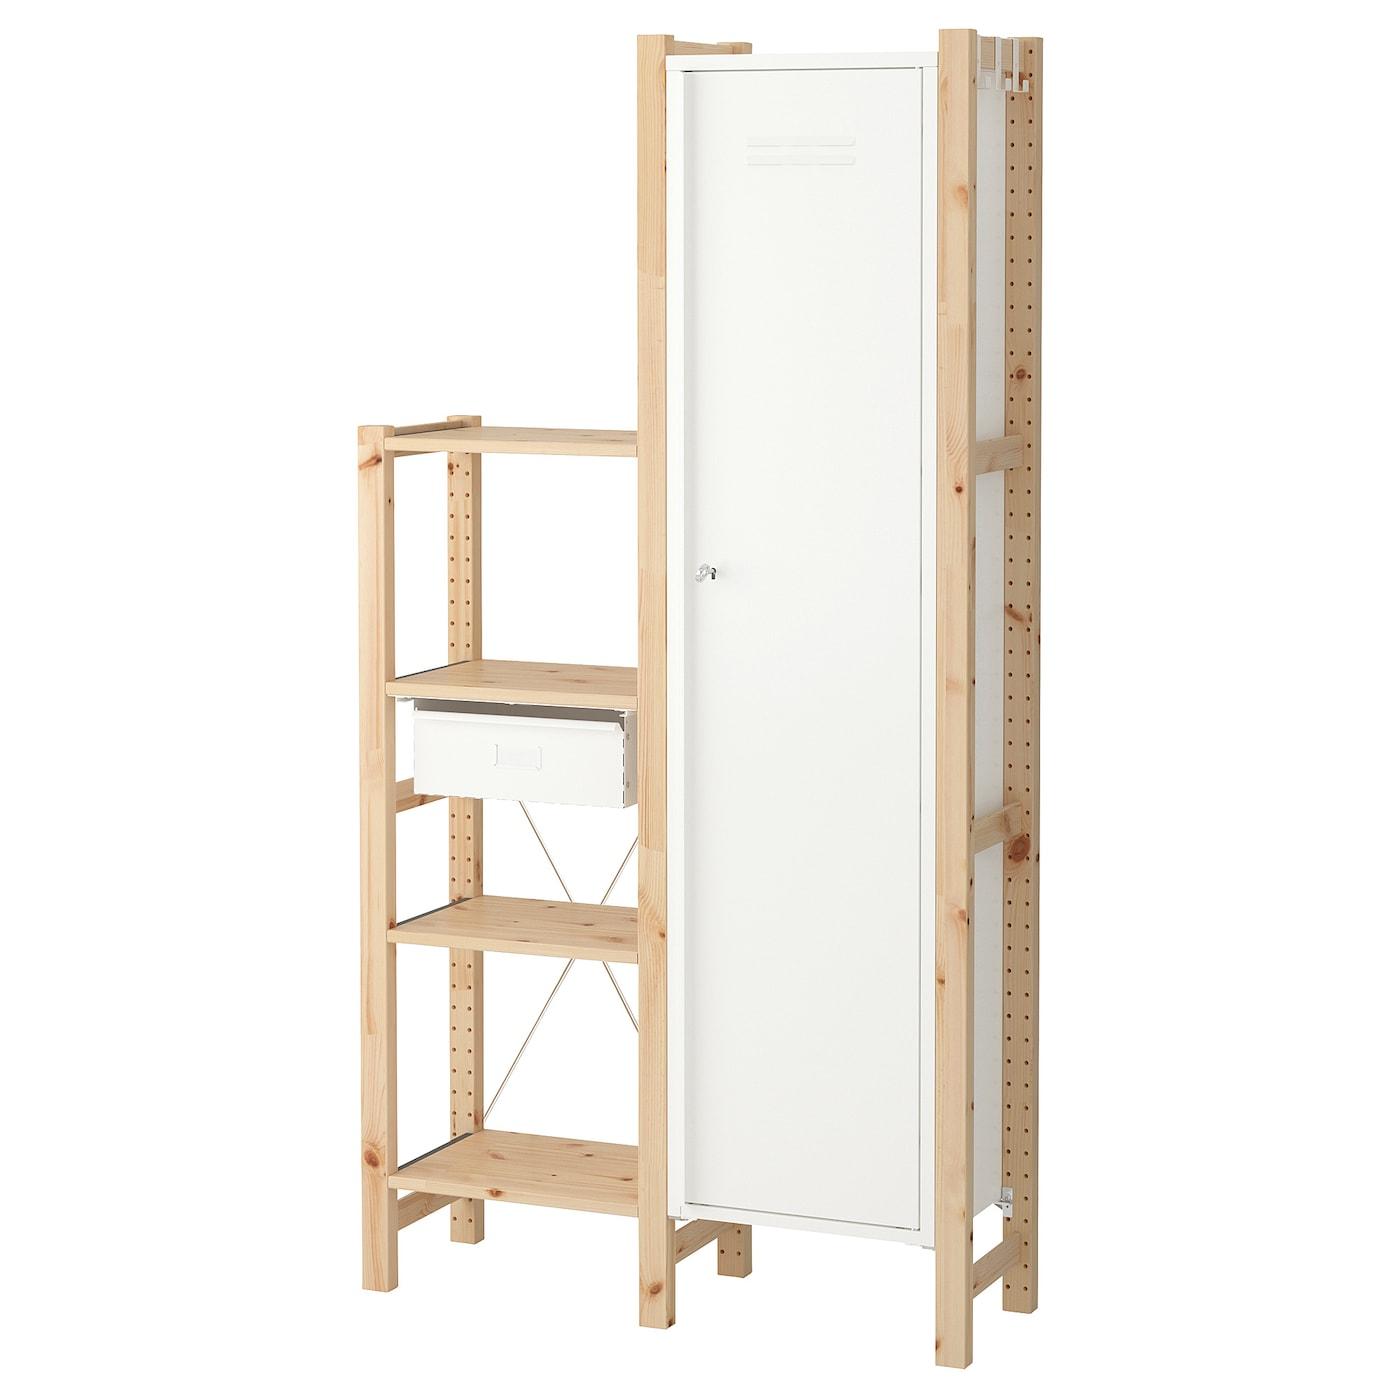 ivar 2 sections tablettes l ment pin blanc 92x30x179 cm ikea. Black Bedroom Furniture Sets. Home Design Ideas